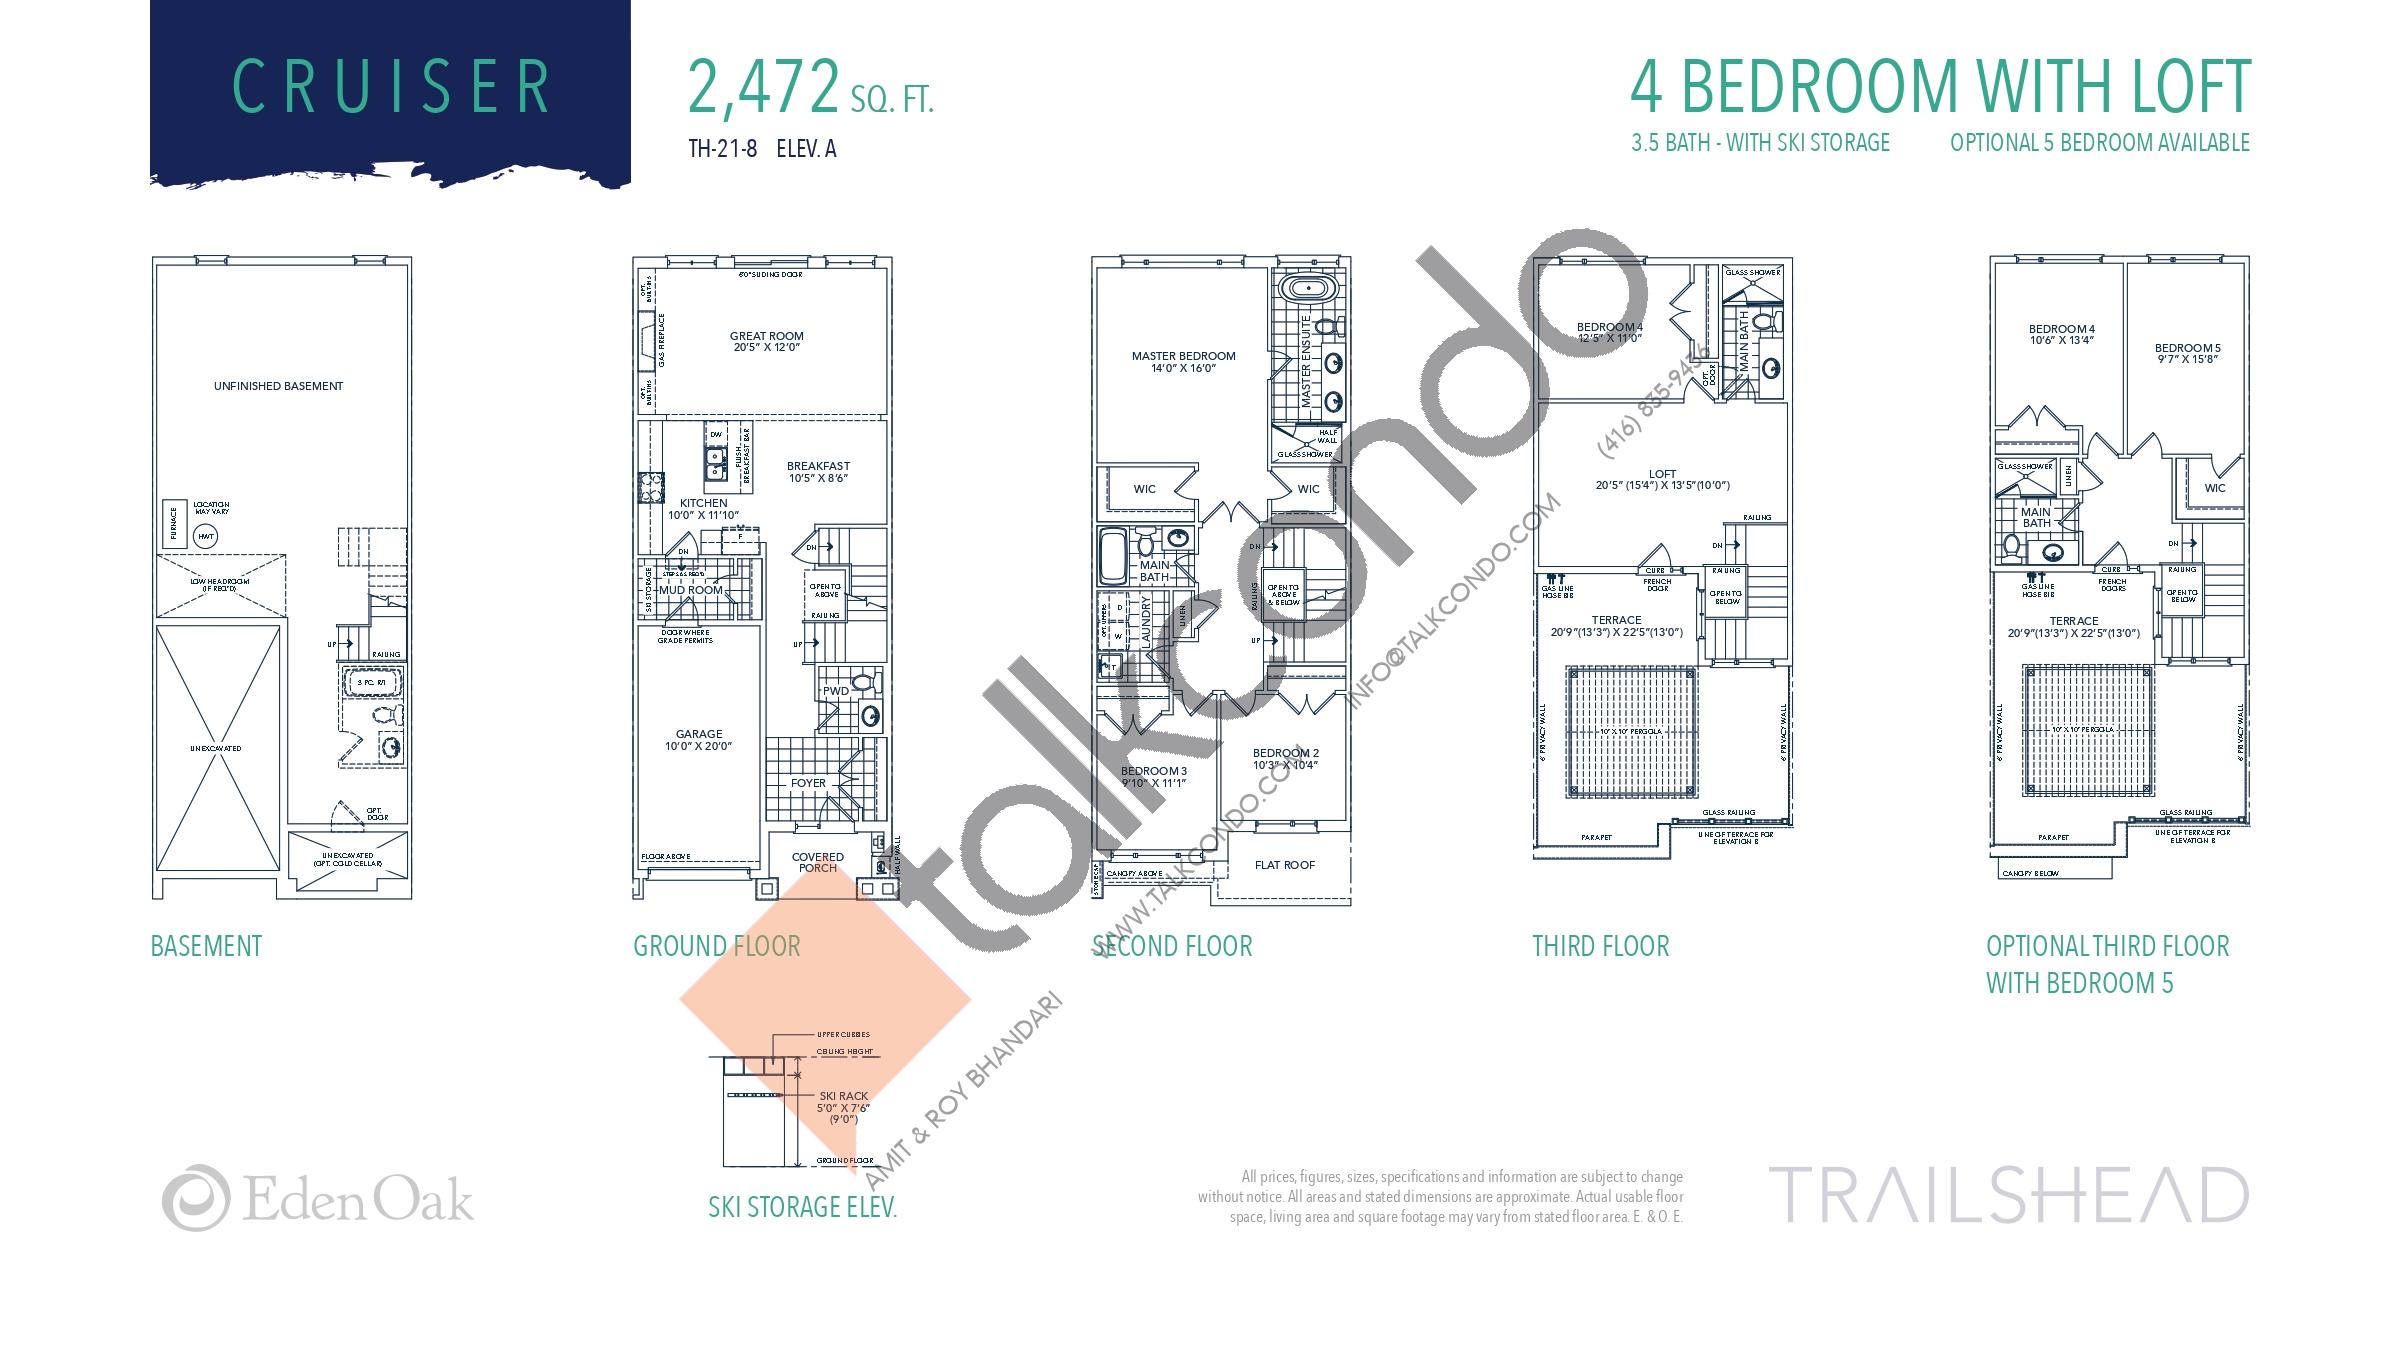 Cruiser (1/2) Floor Plan at Trailshead Towns - 2472 sq.ft